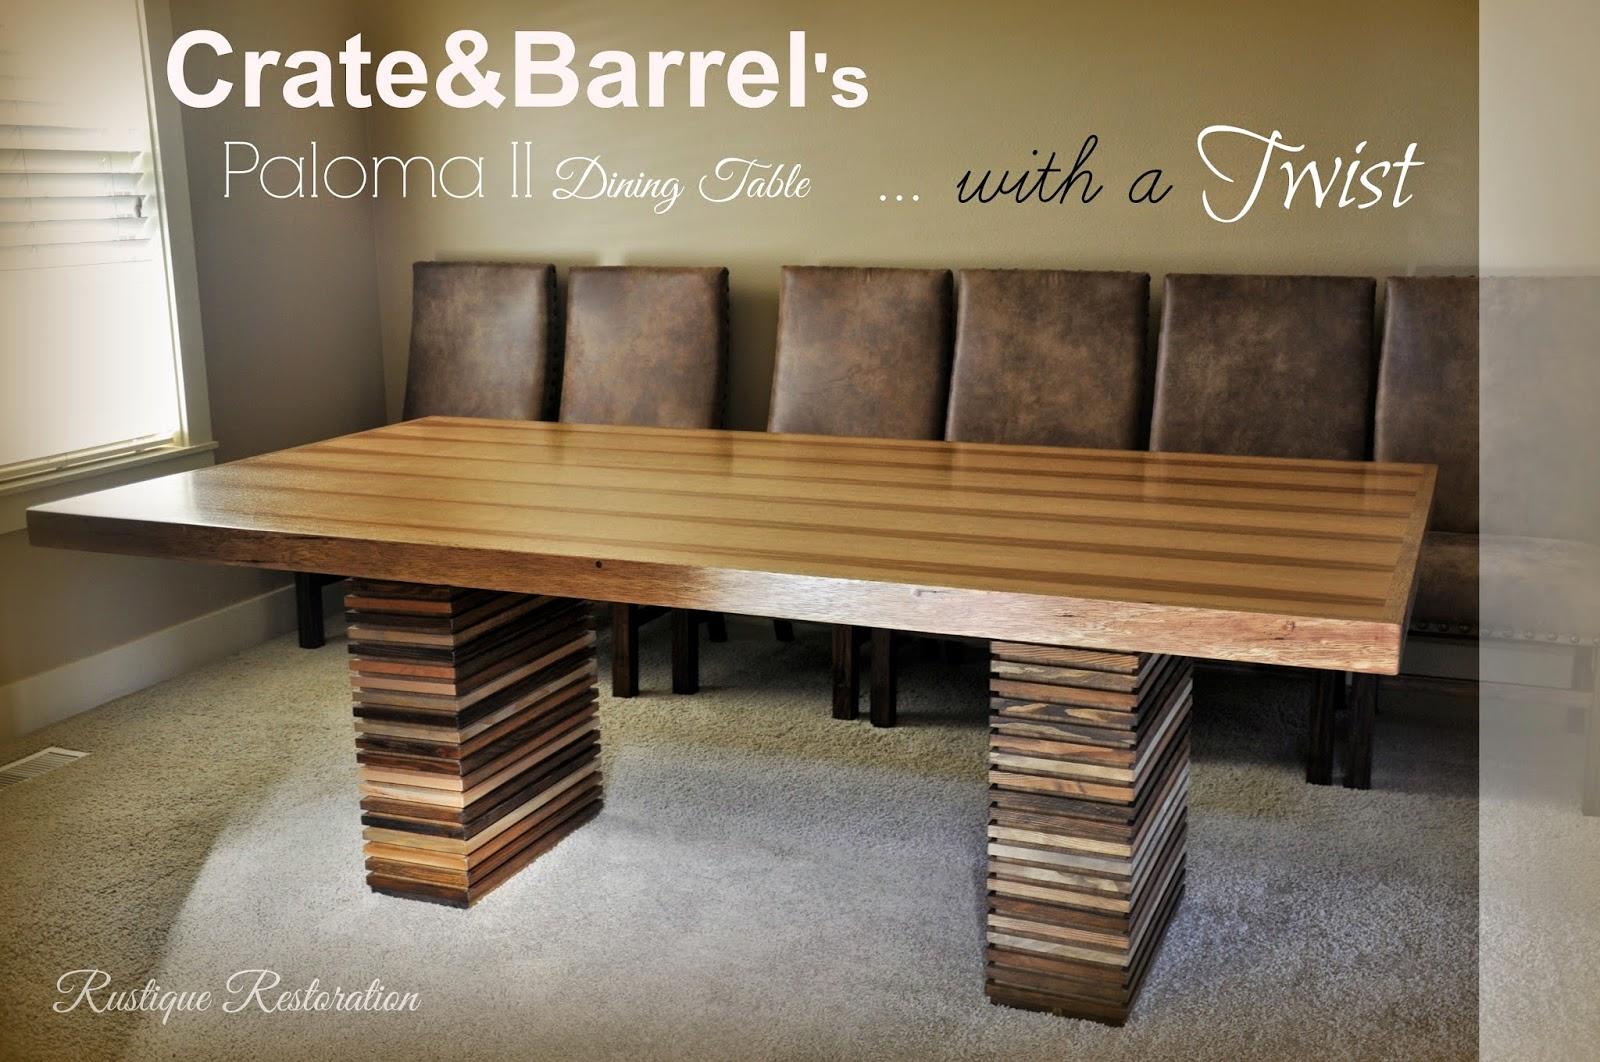 Rustique Restoration: Crate&Barrel's Paloma II Dining ...